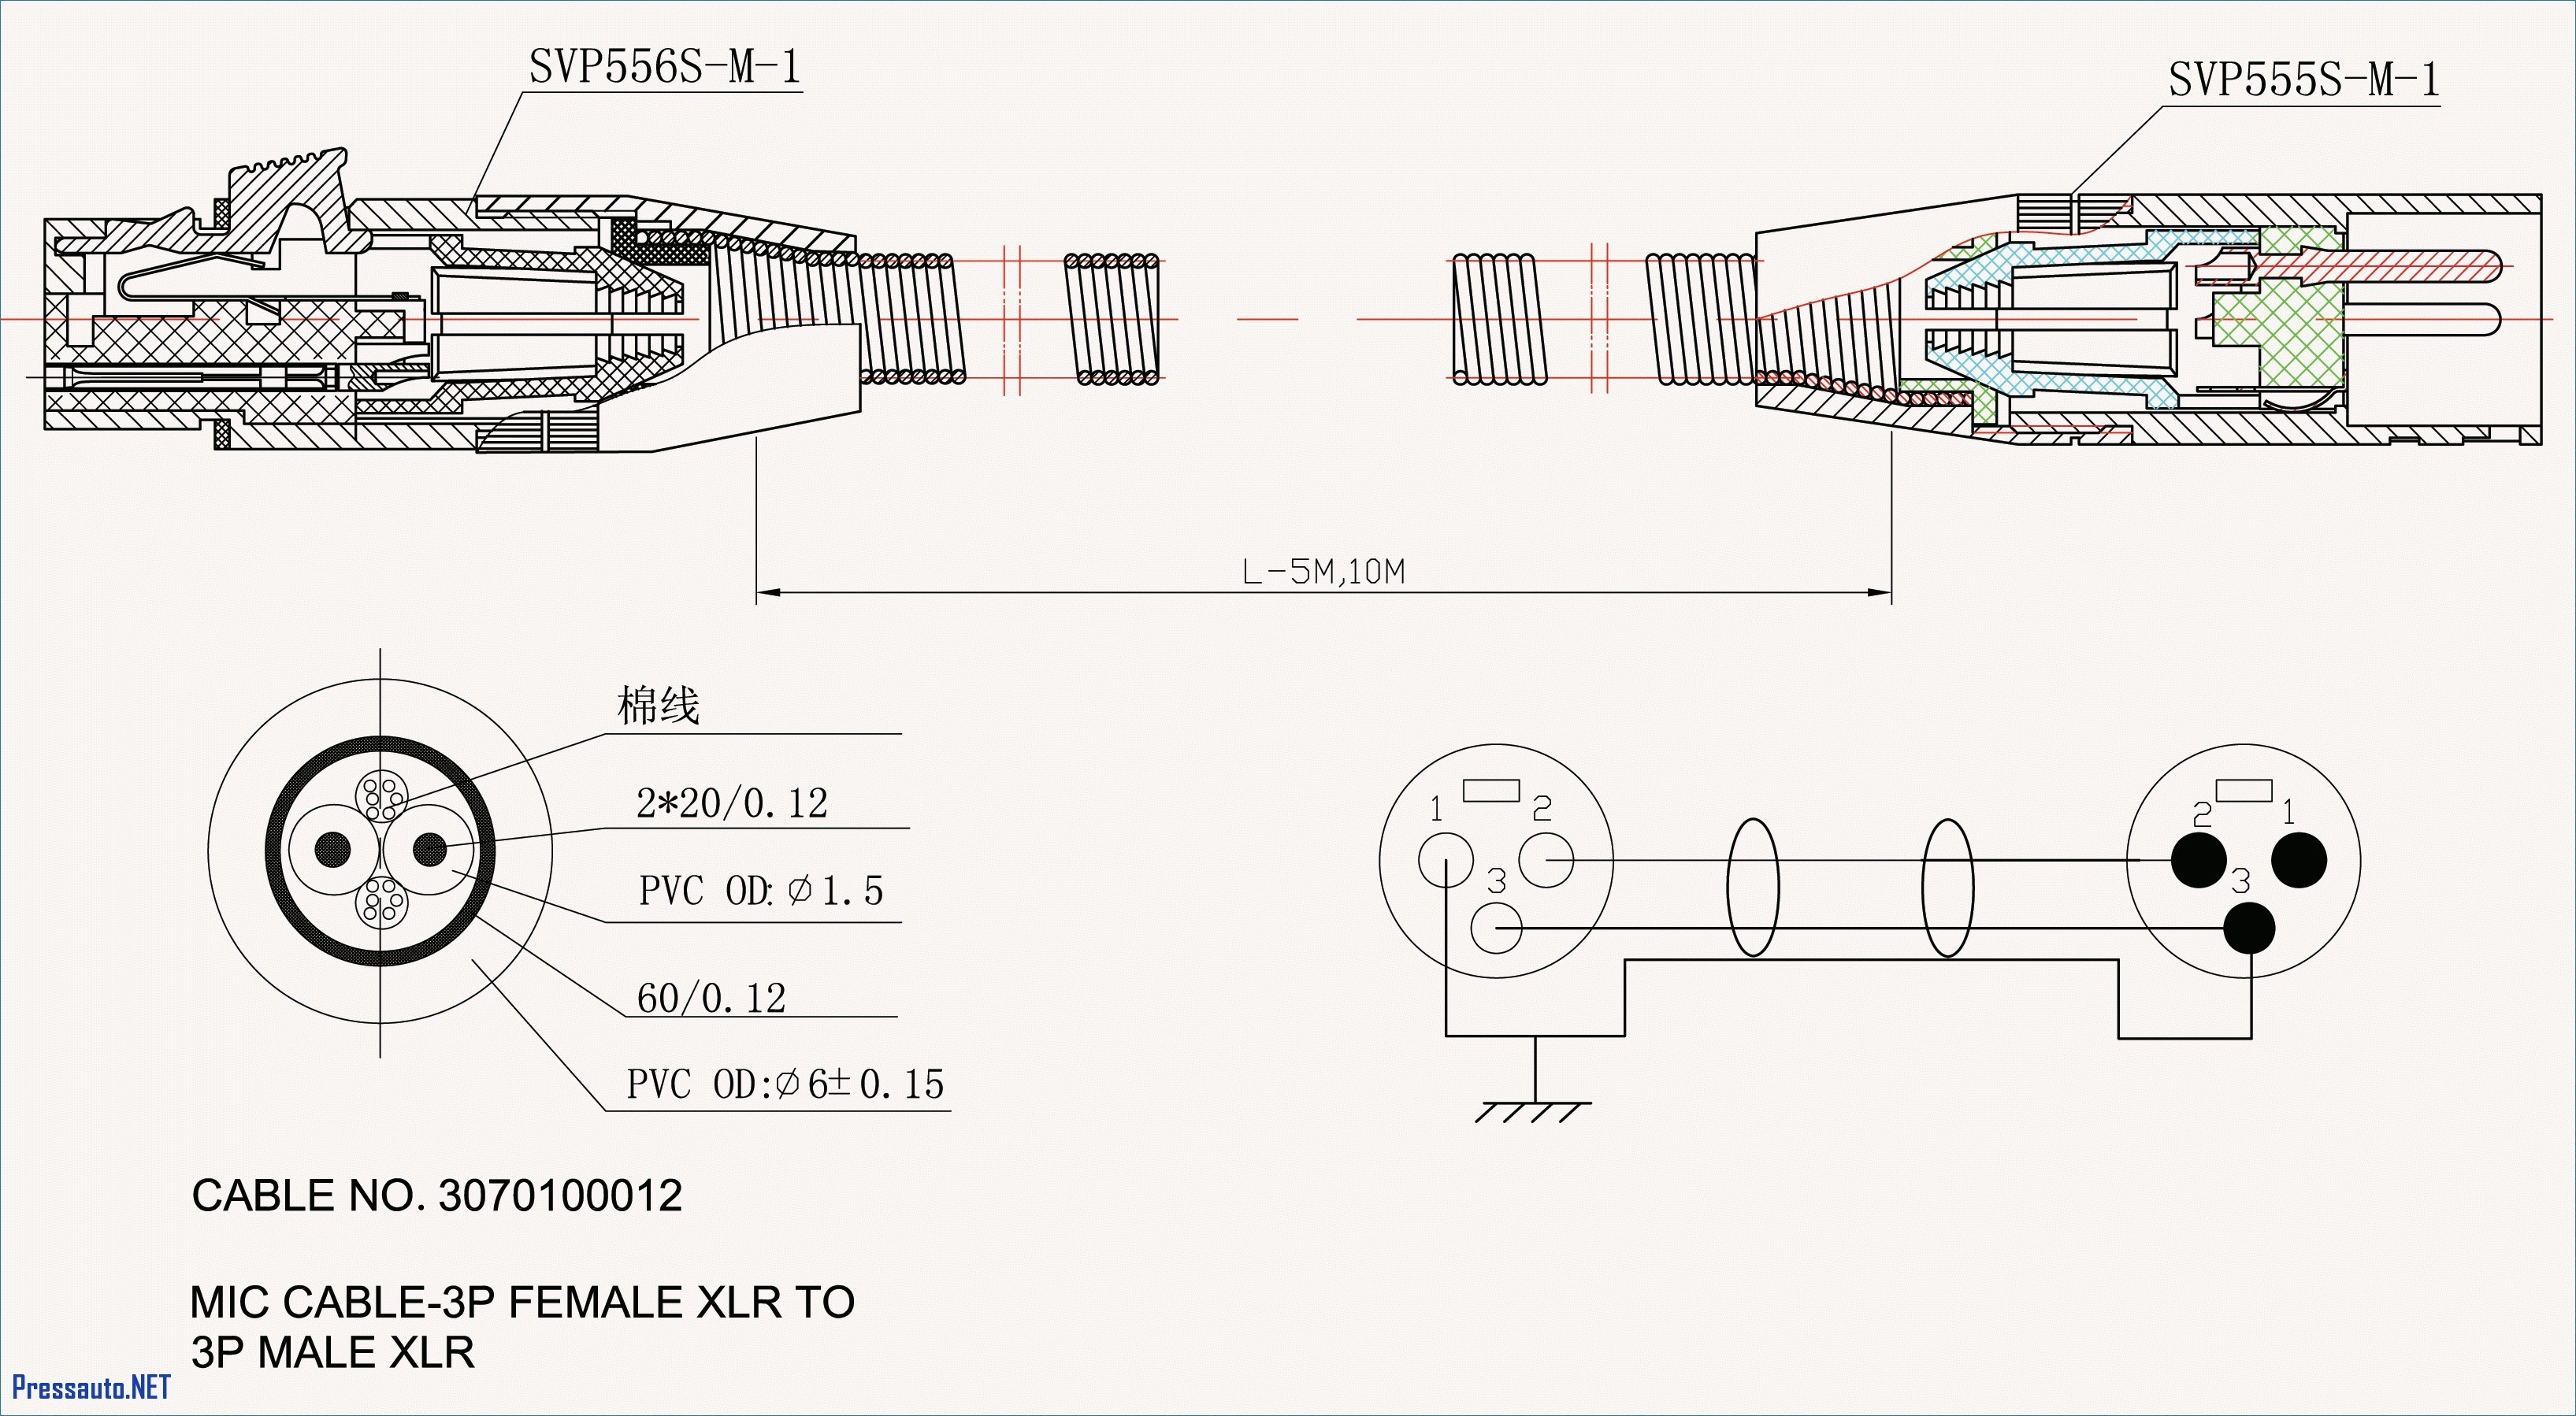 Vw Polo Engine Diagram Vw Wiring Diagram Book 2 Wire Alternator Wiring Diagram Download Of Vw Polo Engine Diagram